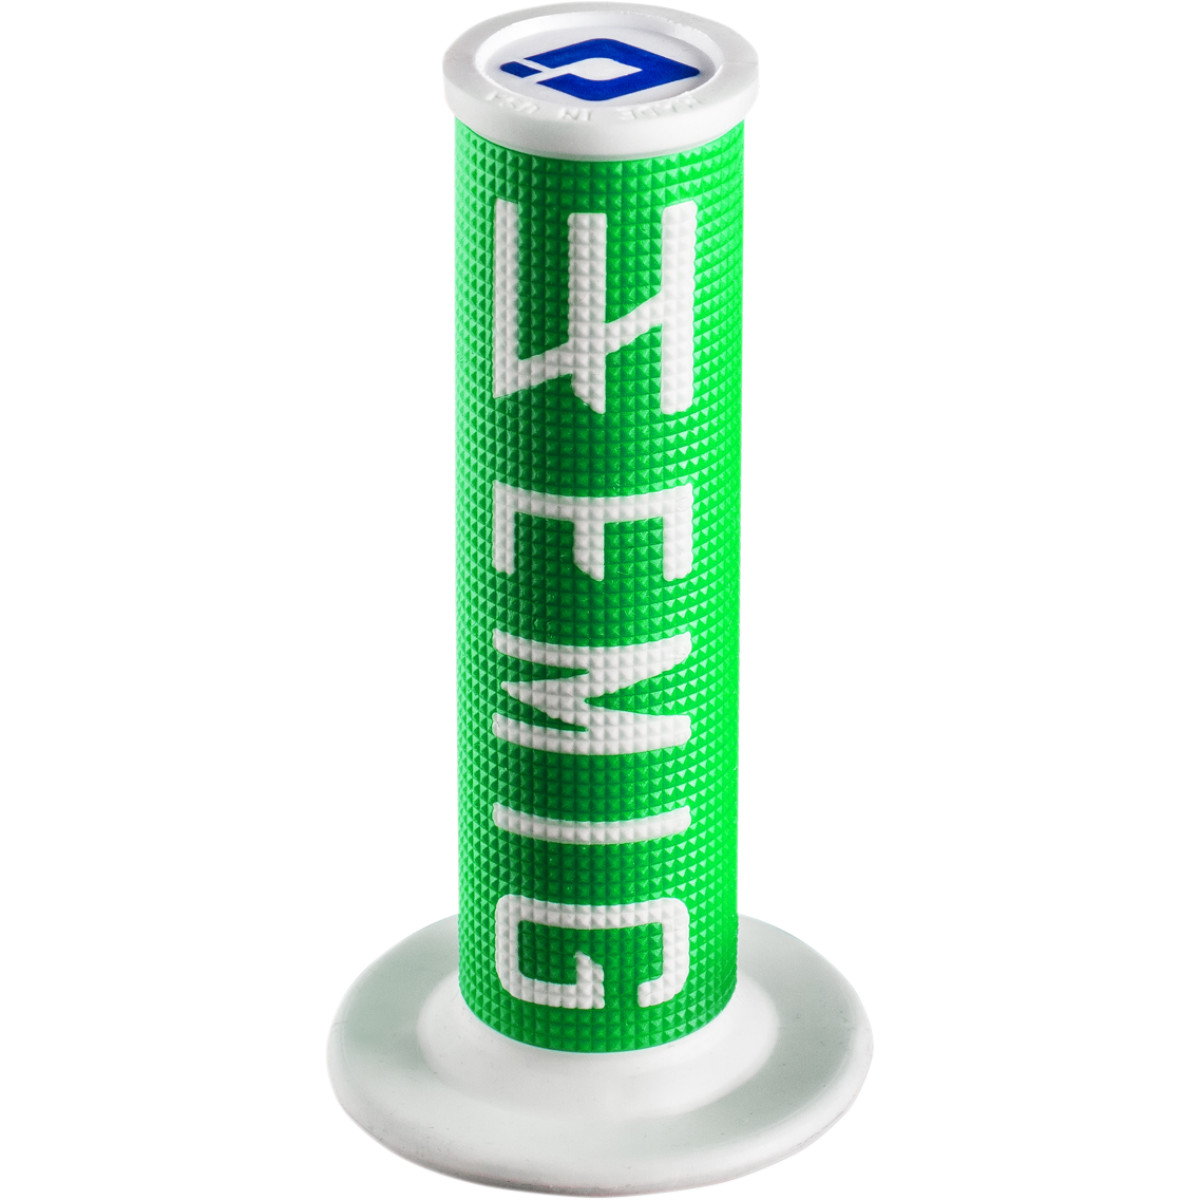 EMIG V2 LOCK ON GRIPS [0630-1439]